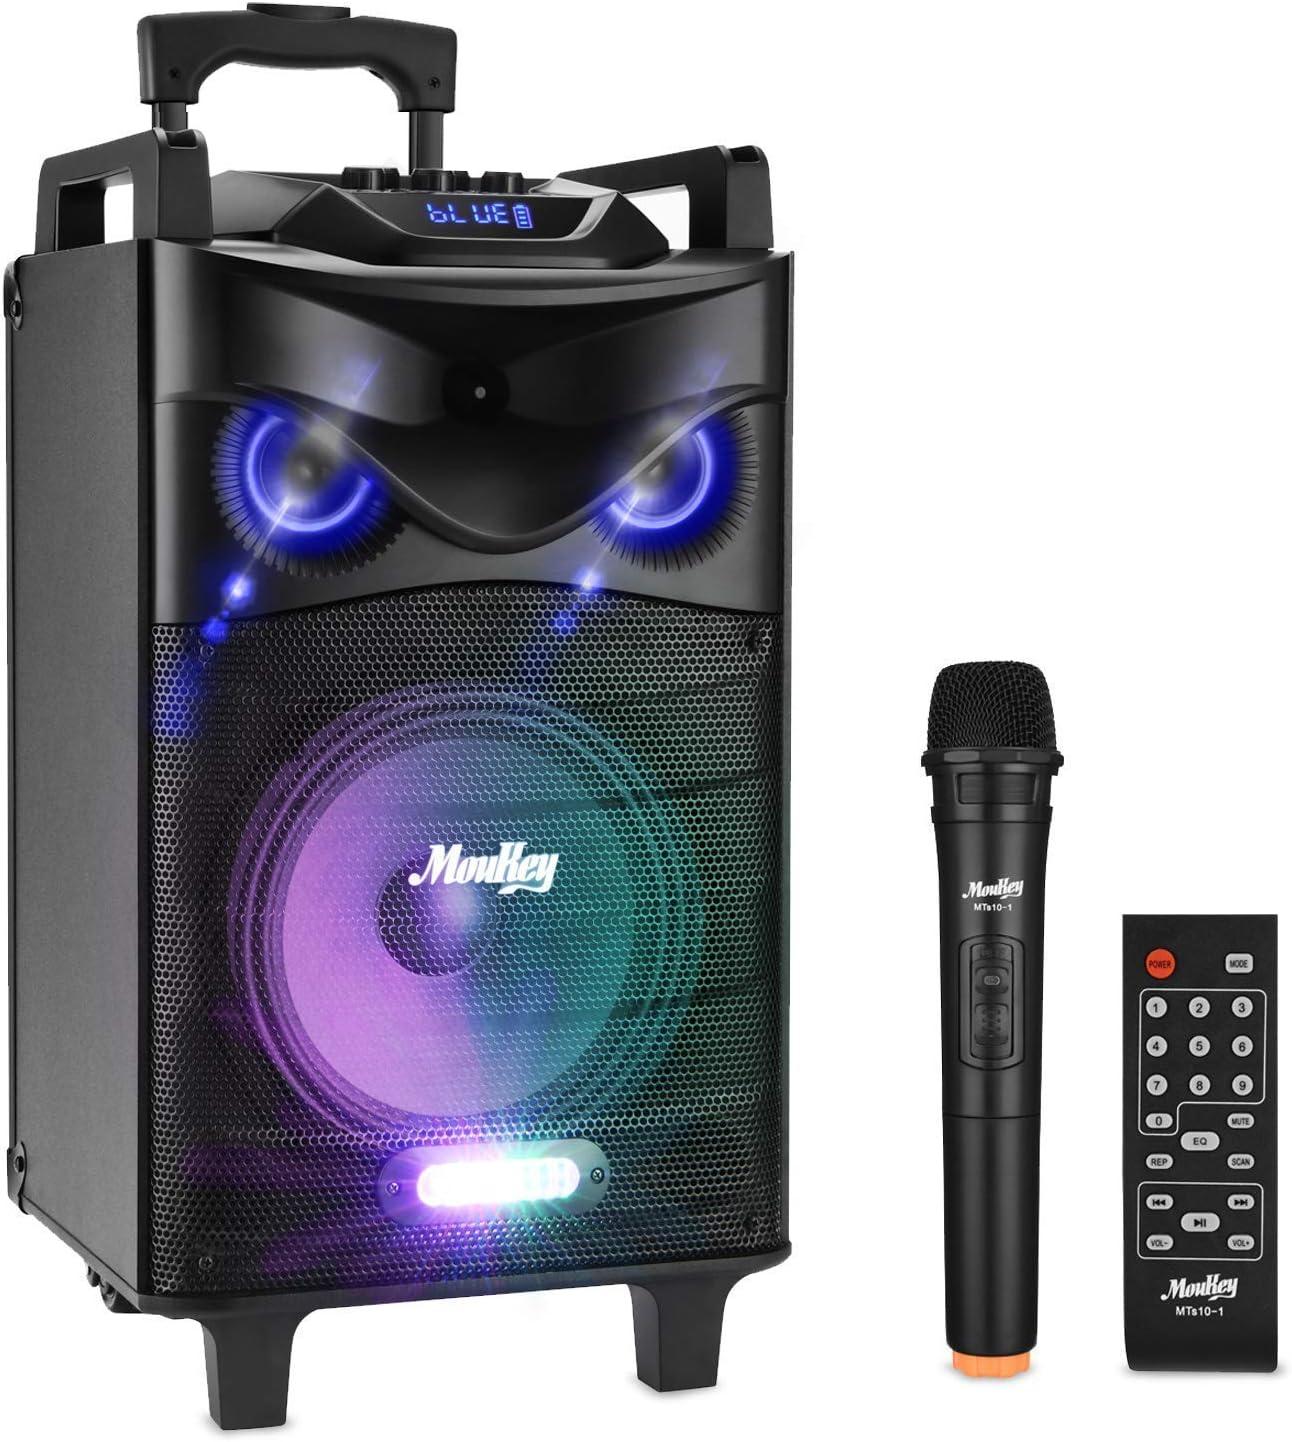 PA Stereo with 10 Subwoofer Moukey Karaoke Machine,140 Watt Bluetooth Karaoke Speaker MP3//USB//TF//AUX Wireless Microphone Headset VHF Microphone DJ Lights Recording Rechargeable Battery